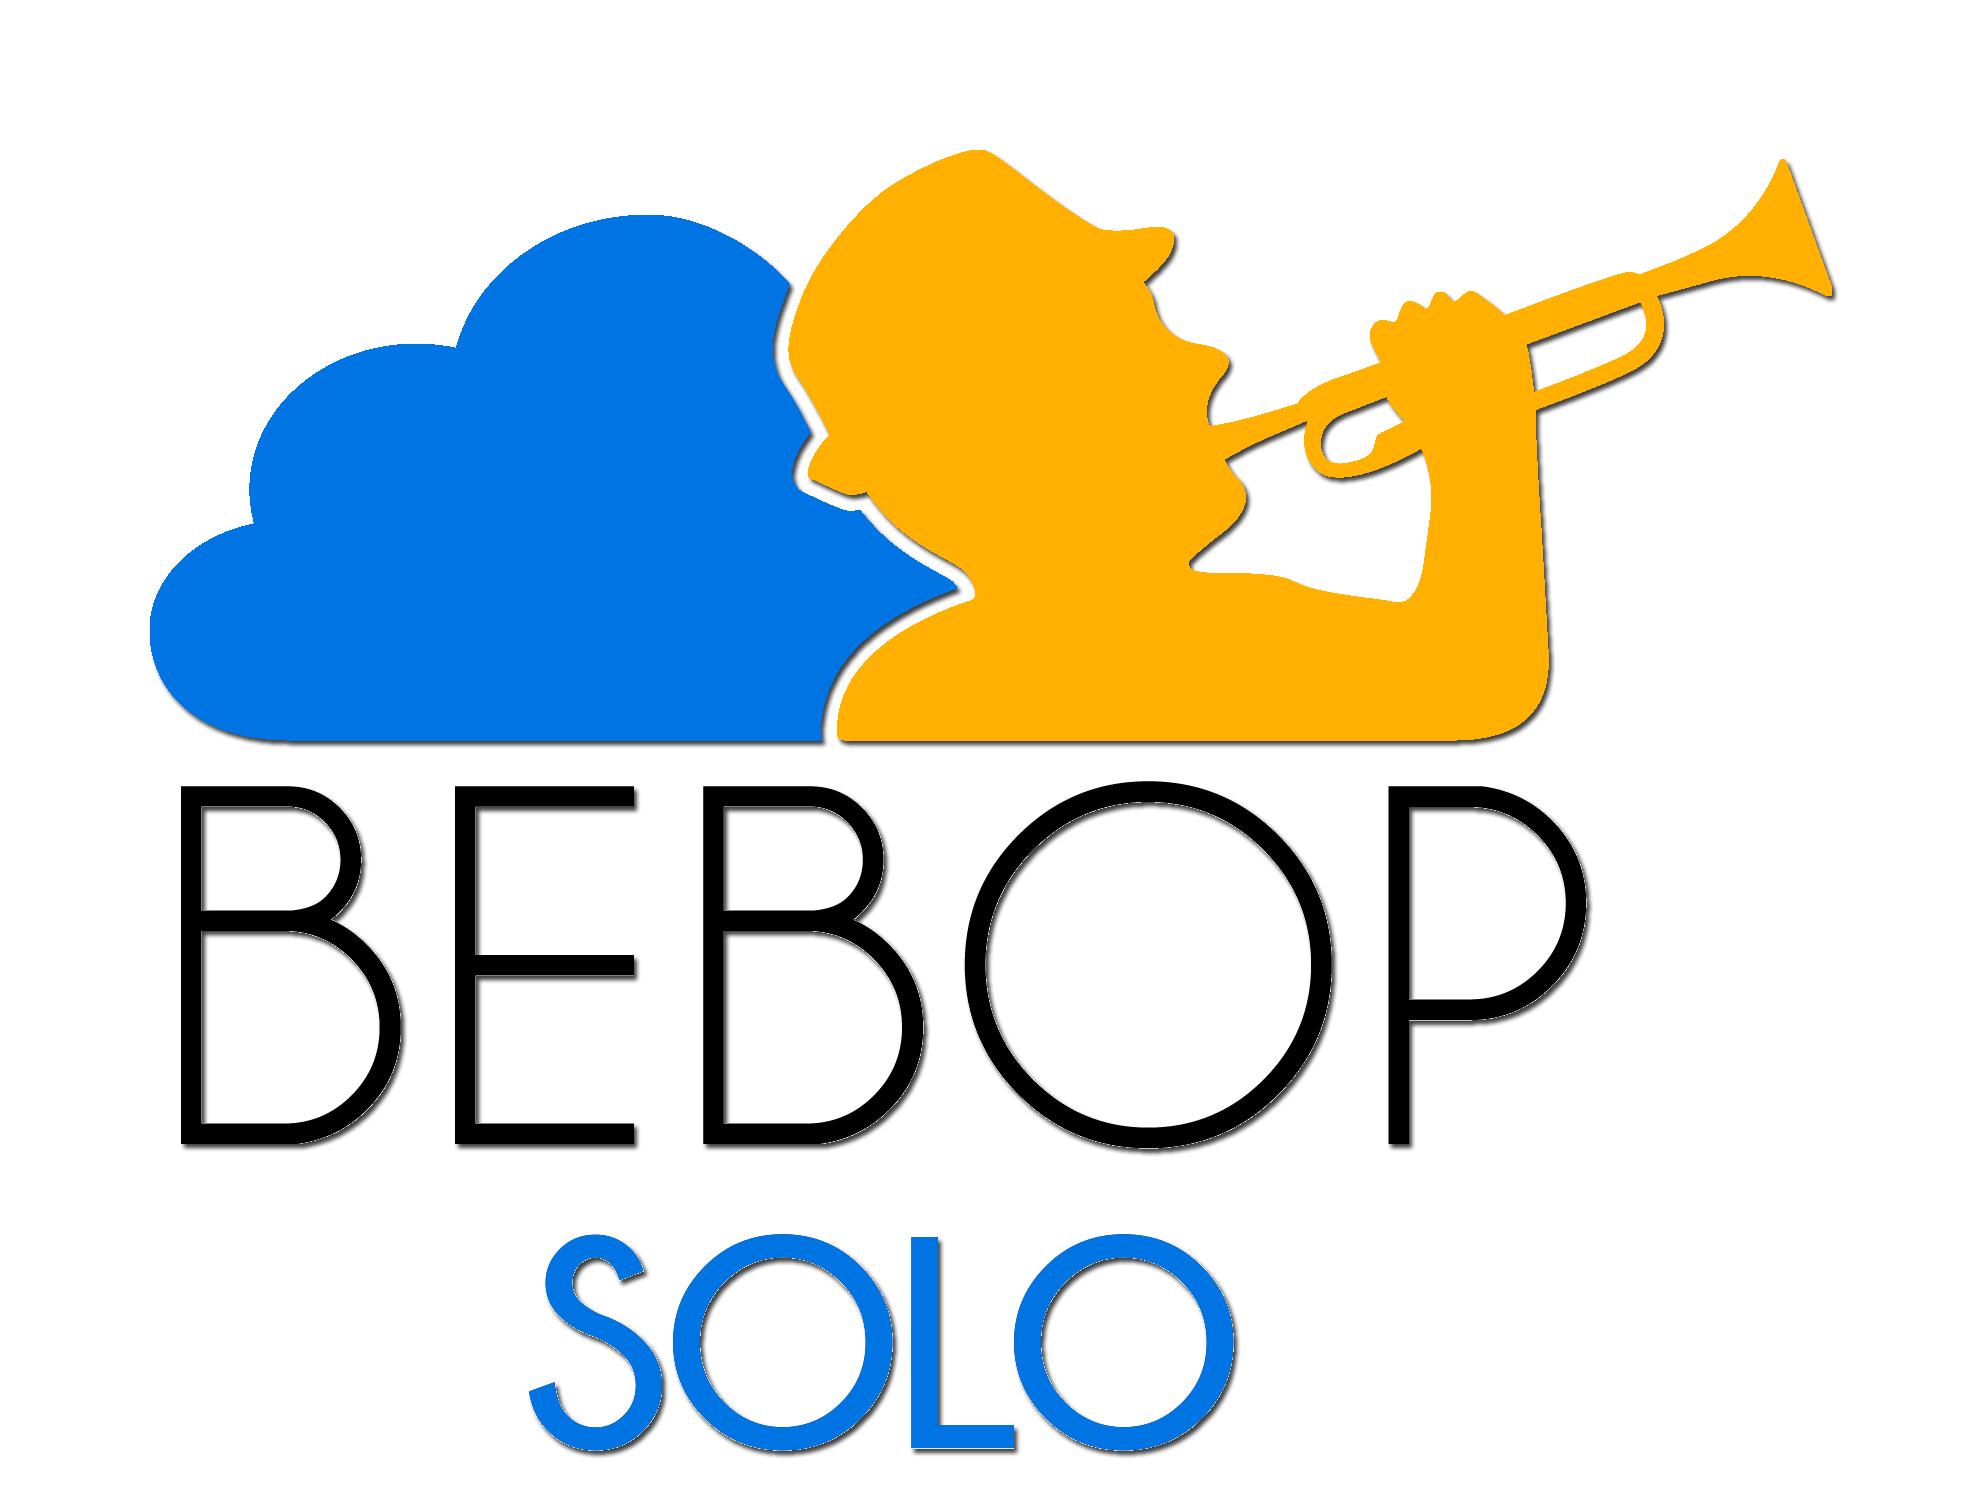 BeBop Solo Cloud Video Editing Software